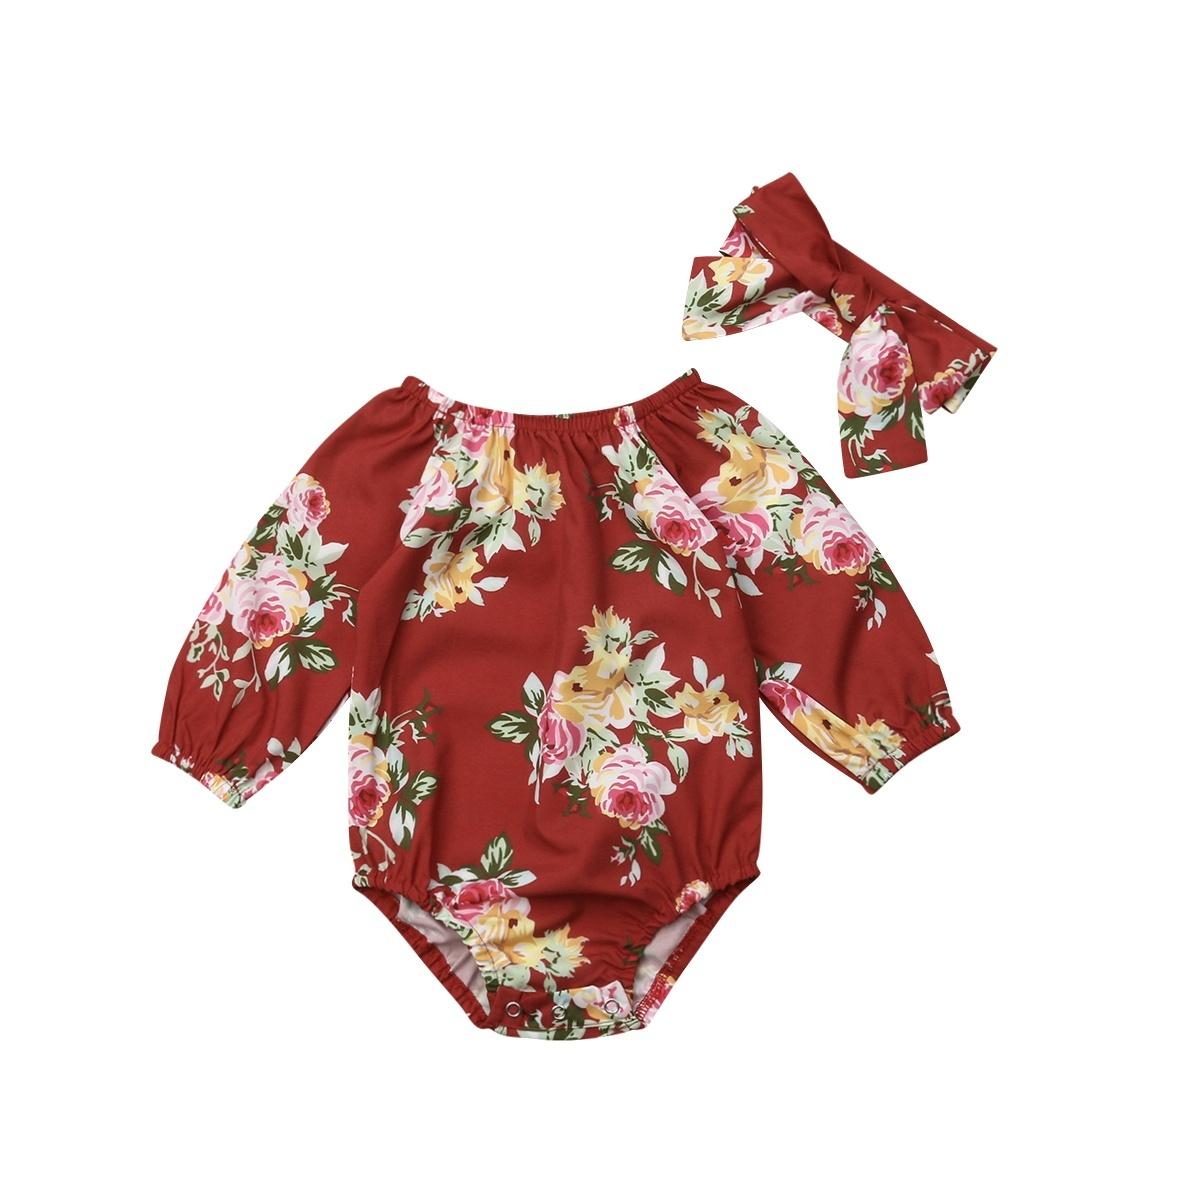 Newborn Baby Girls Flower Romper Bodysuit Jumpsuit Headband Outfits Clothes Set